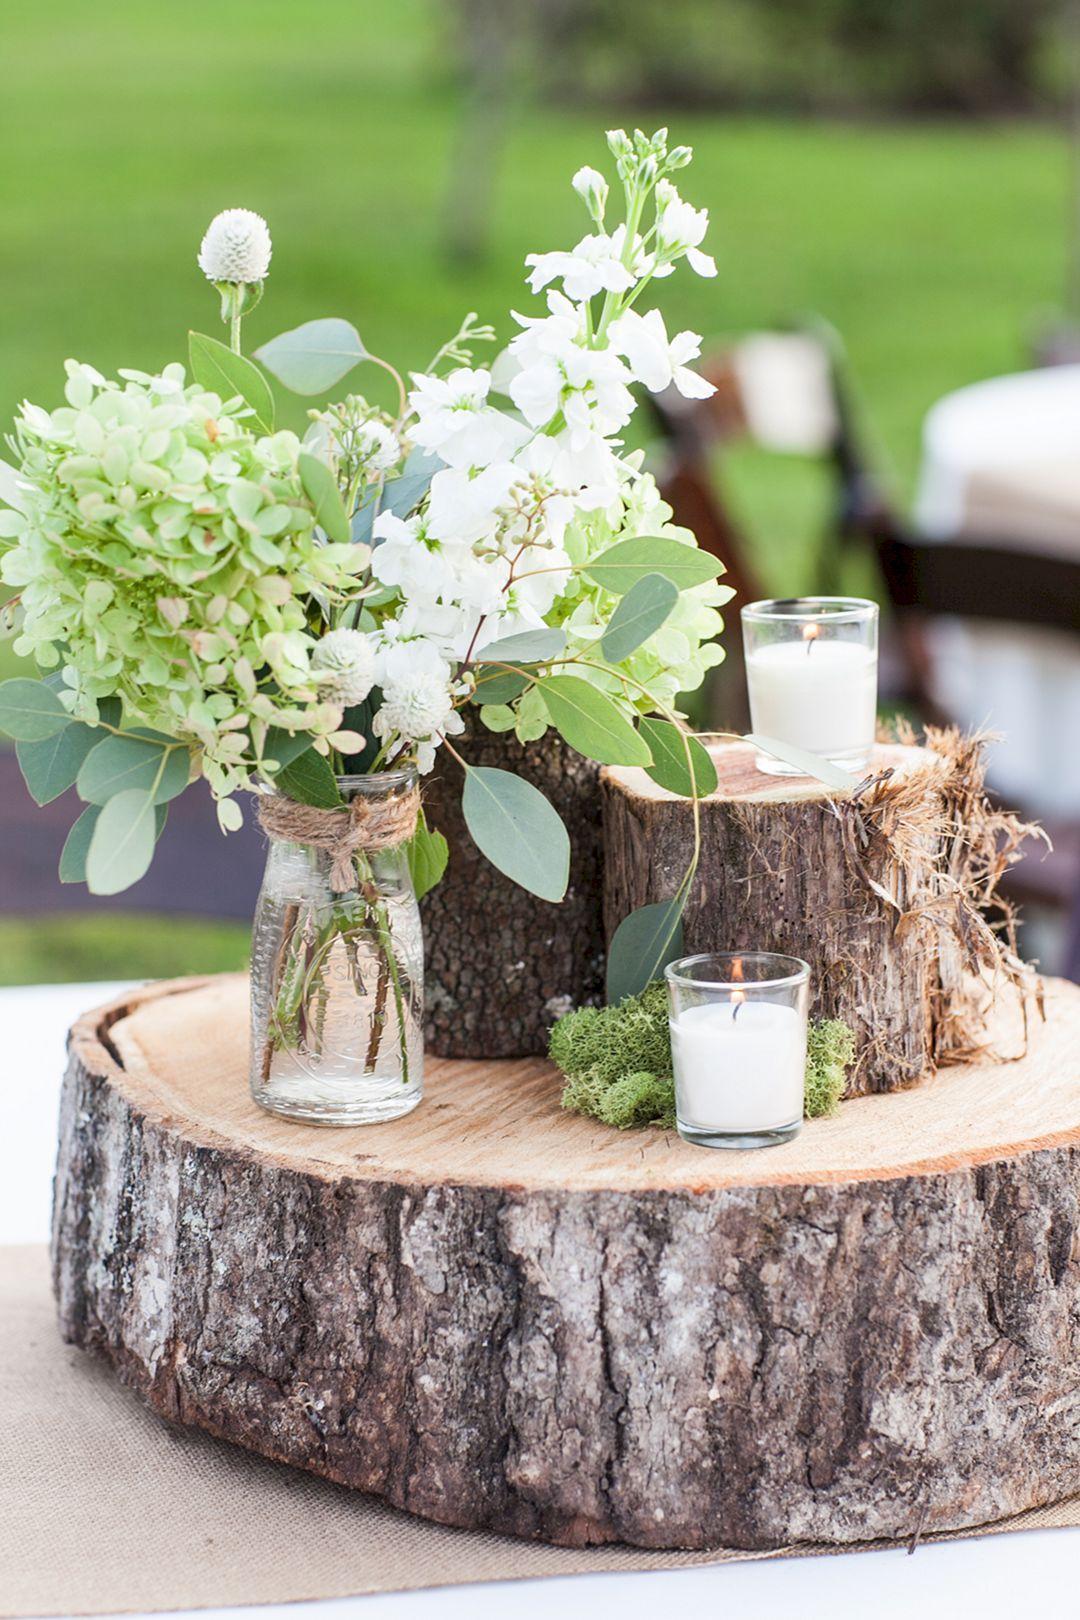 10 Marvelous Diy Rustic Cheap Wedding Centerpieces Ideas Spring Wedding Centerpieces Summer Wedding Decorations Rustic Farm Wedding